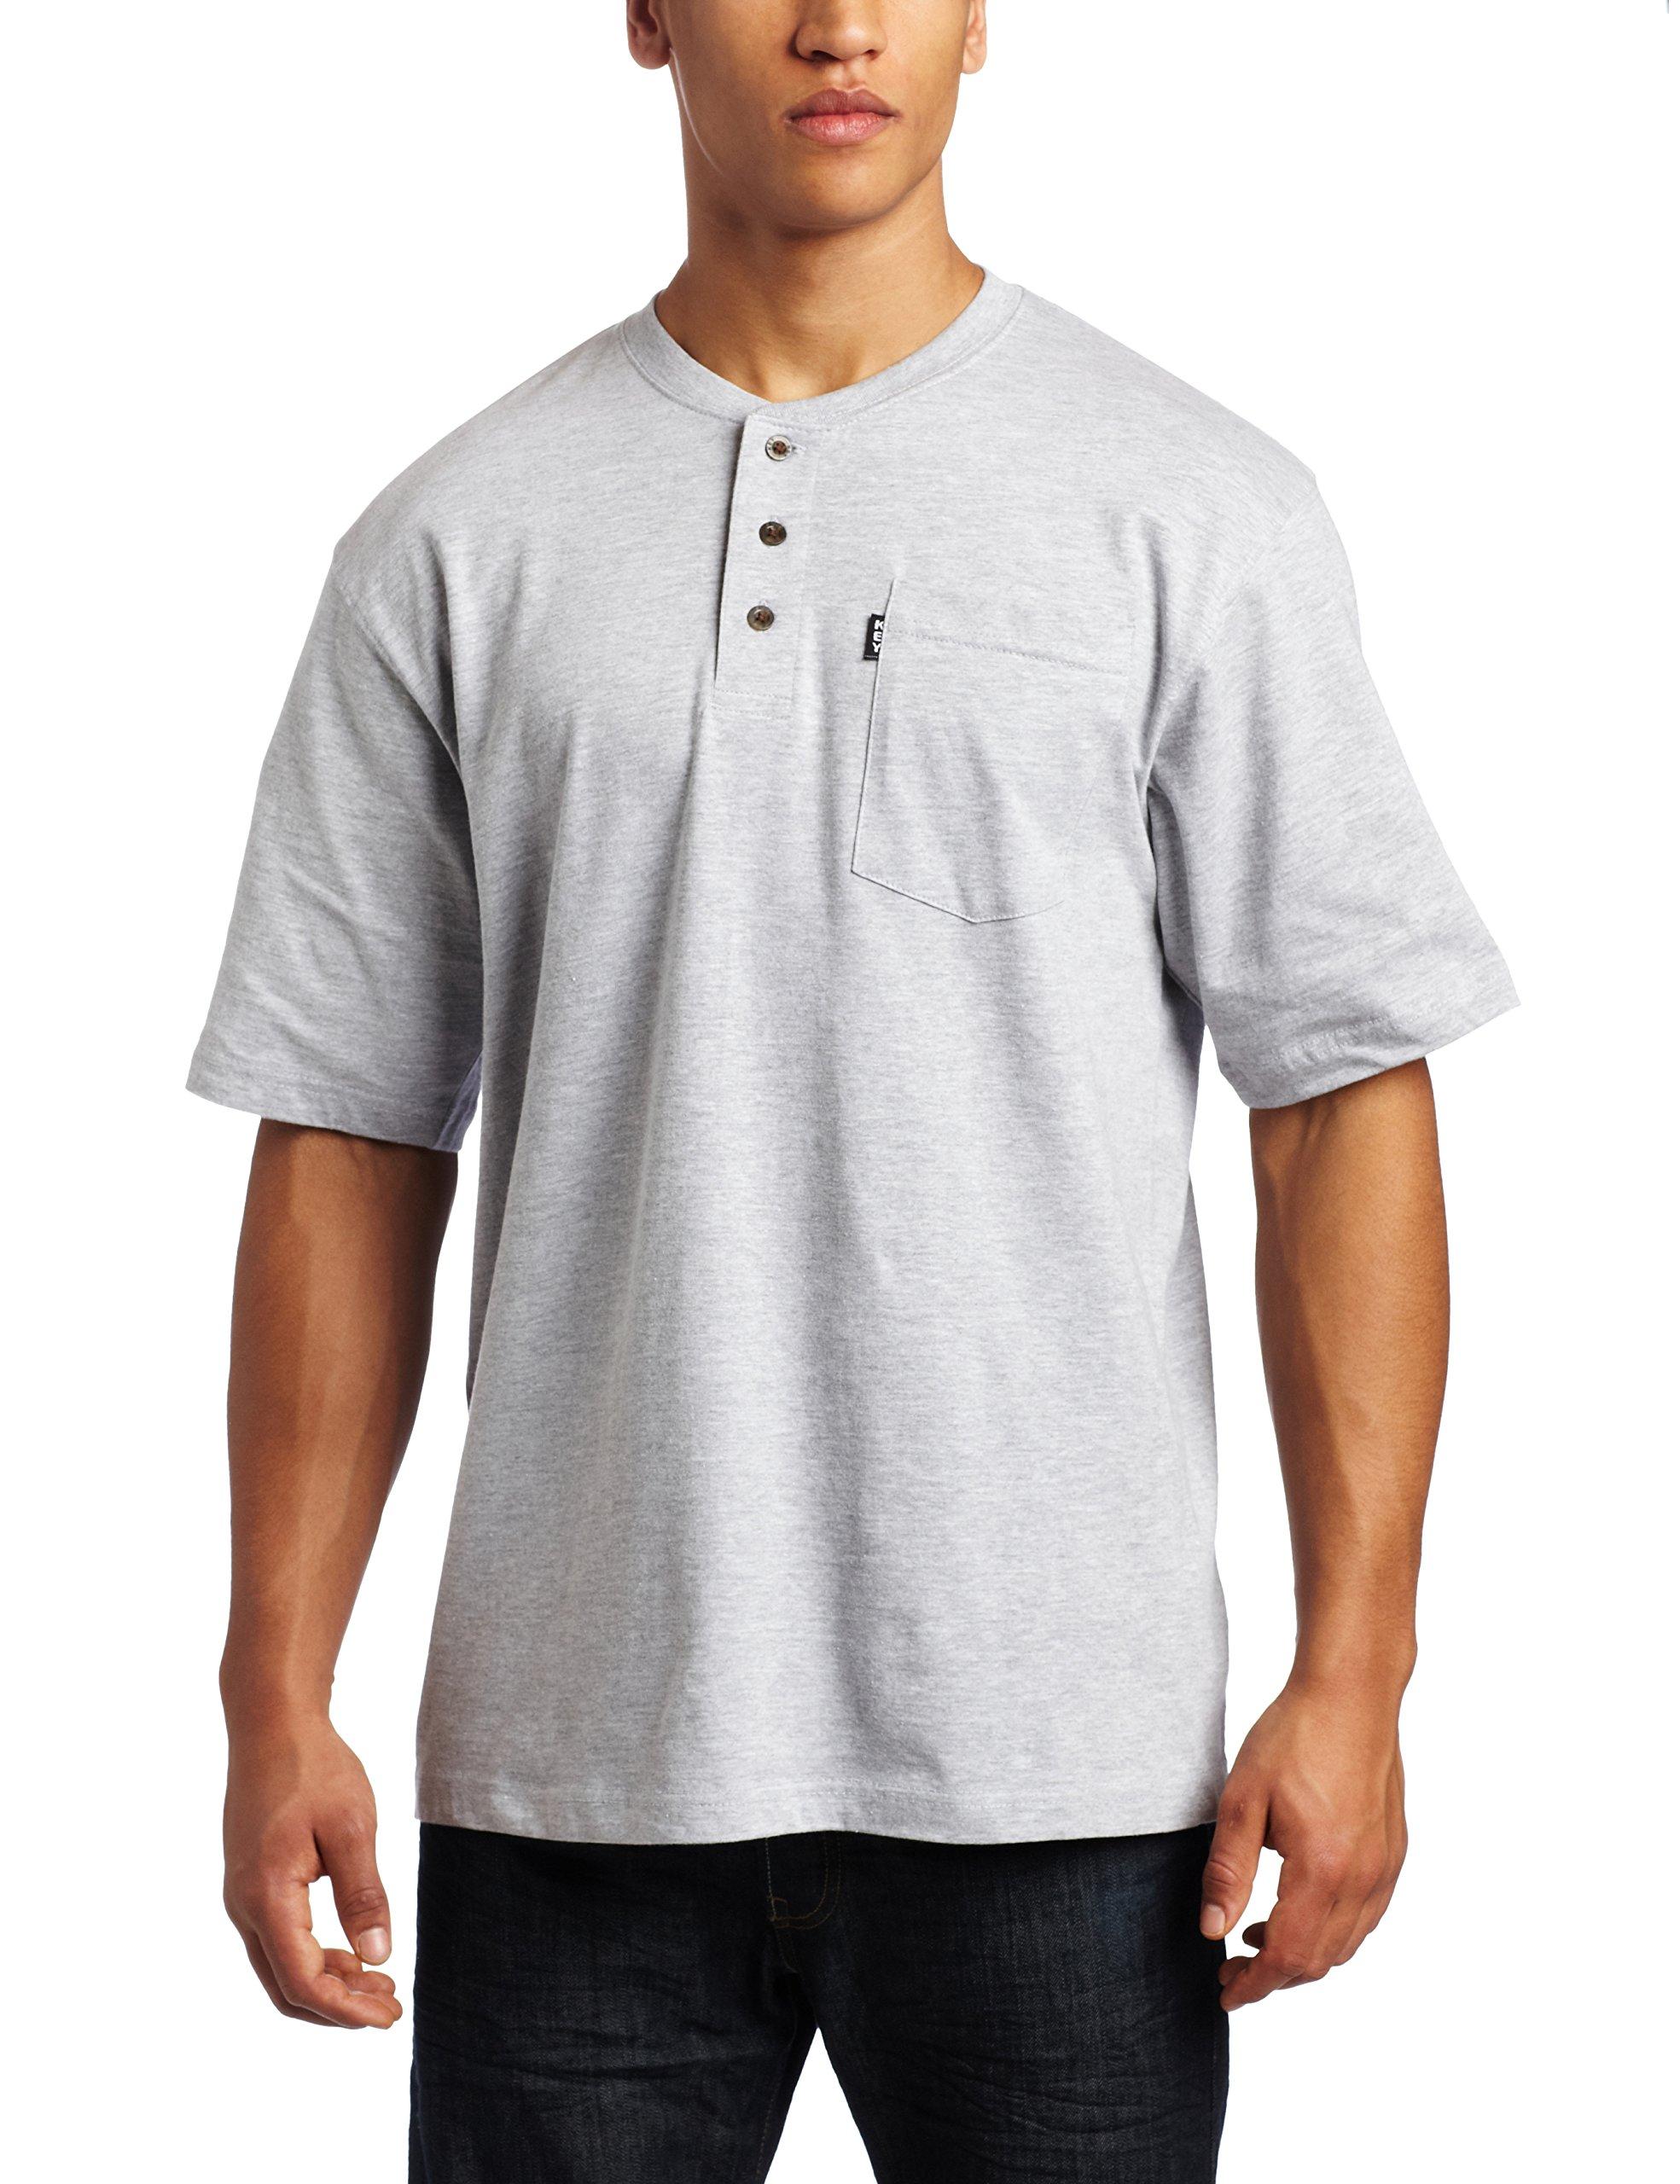 Key Apparel Men's Short Sleeve Heavyweight 3-Button Pocket Henley, Heather Grey, XX-Large-Regular